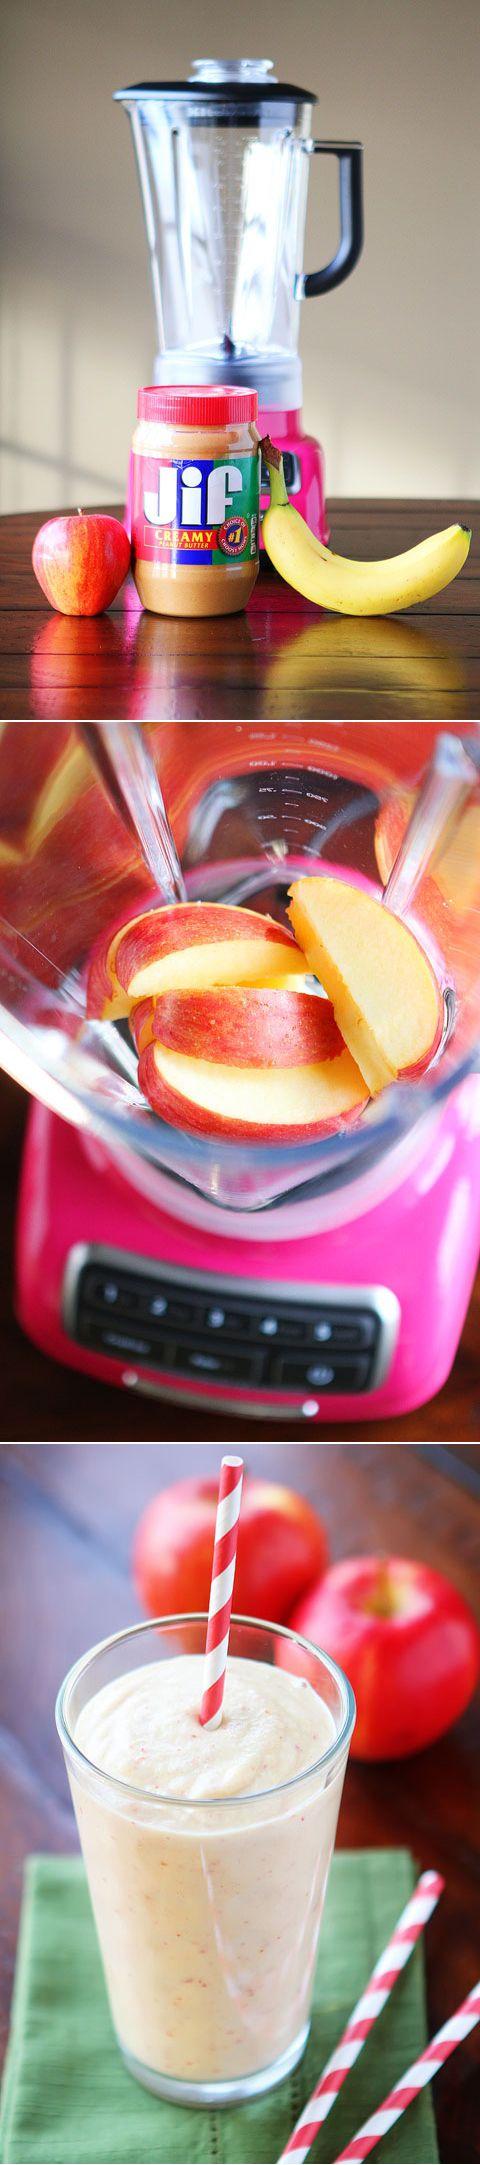 Peanut Butter Banana Apple Smoothie: 1 apple cut, 1 banana cut, 1 C ice cubes, 2 tbsp peanut butter. Put in blender and enjoy!